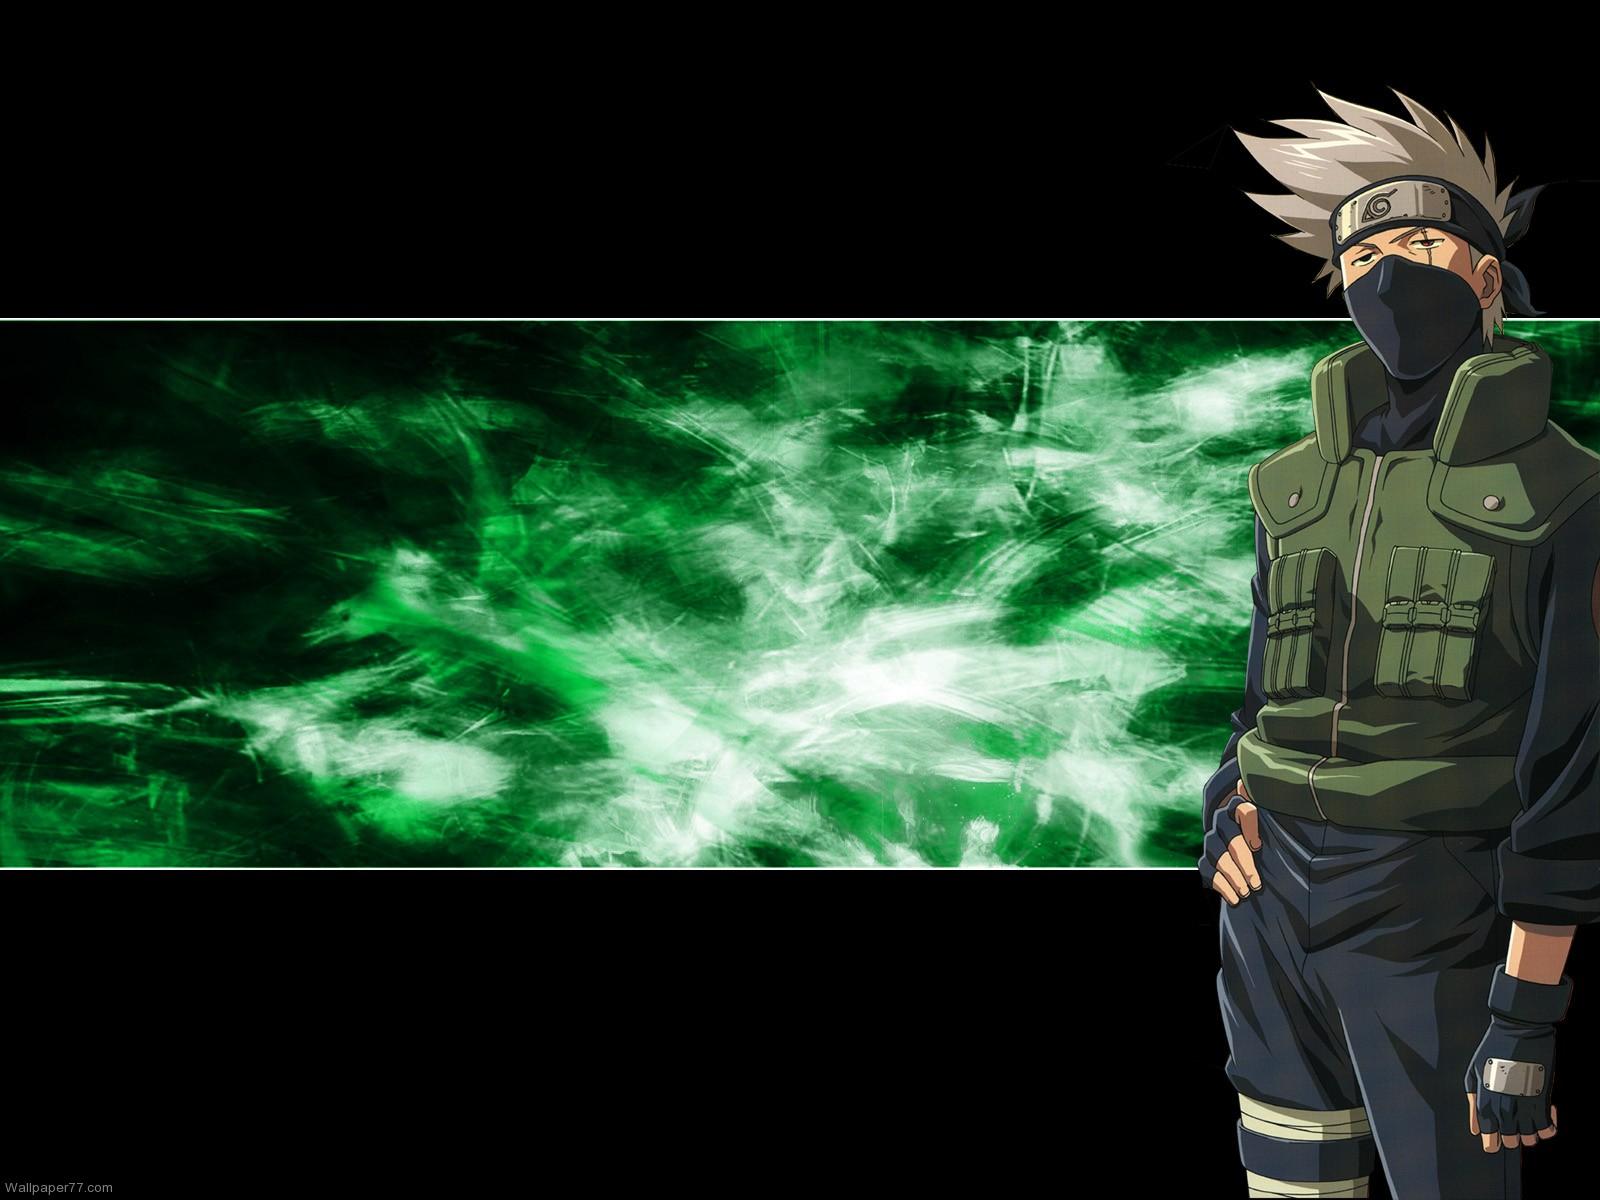 Wallpapers tagged Anime Wallpaper Manga Wallpapers Naruto Wallpaper 1600x1200